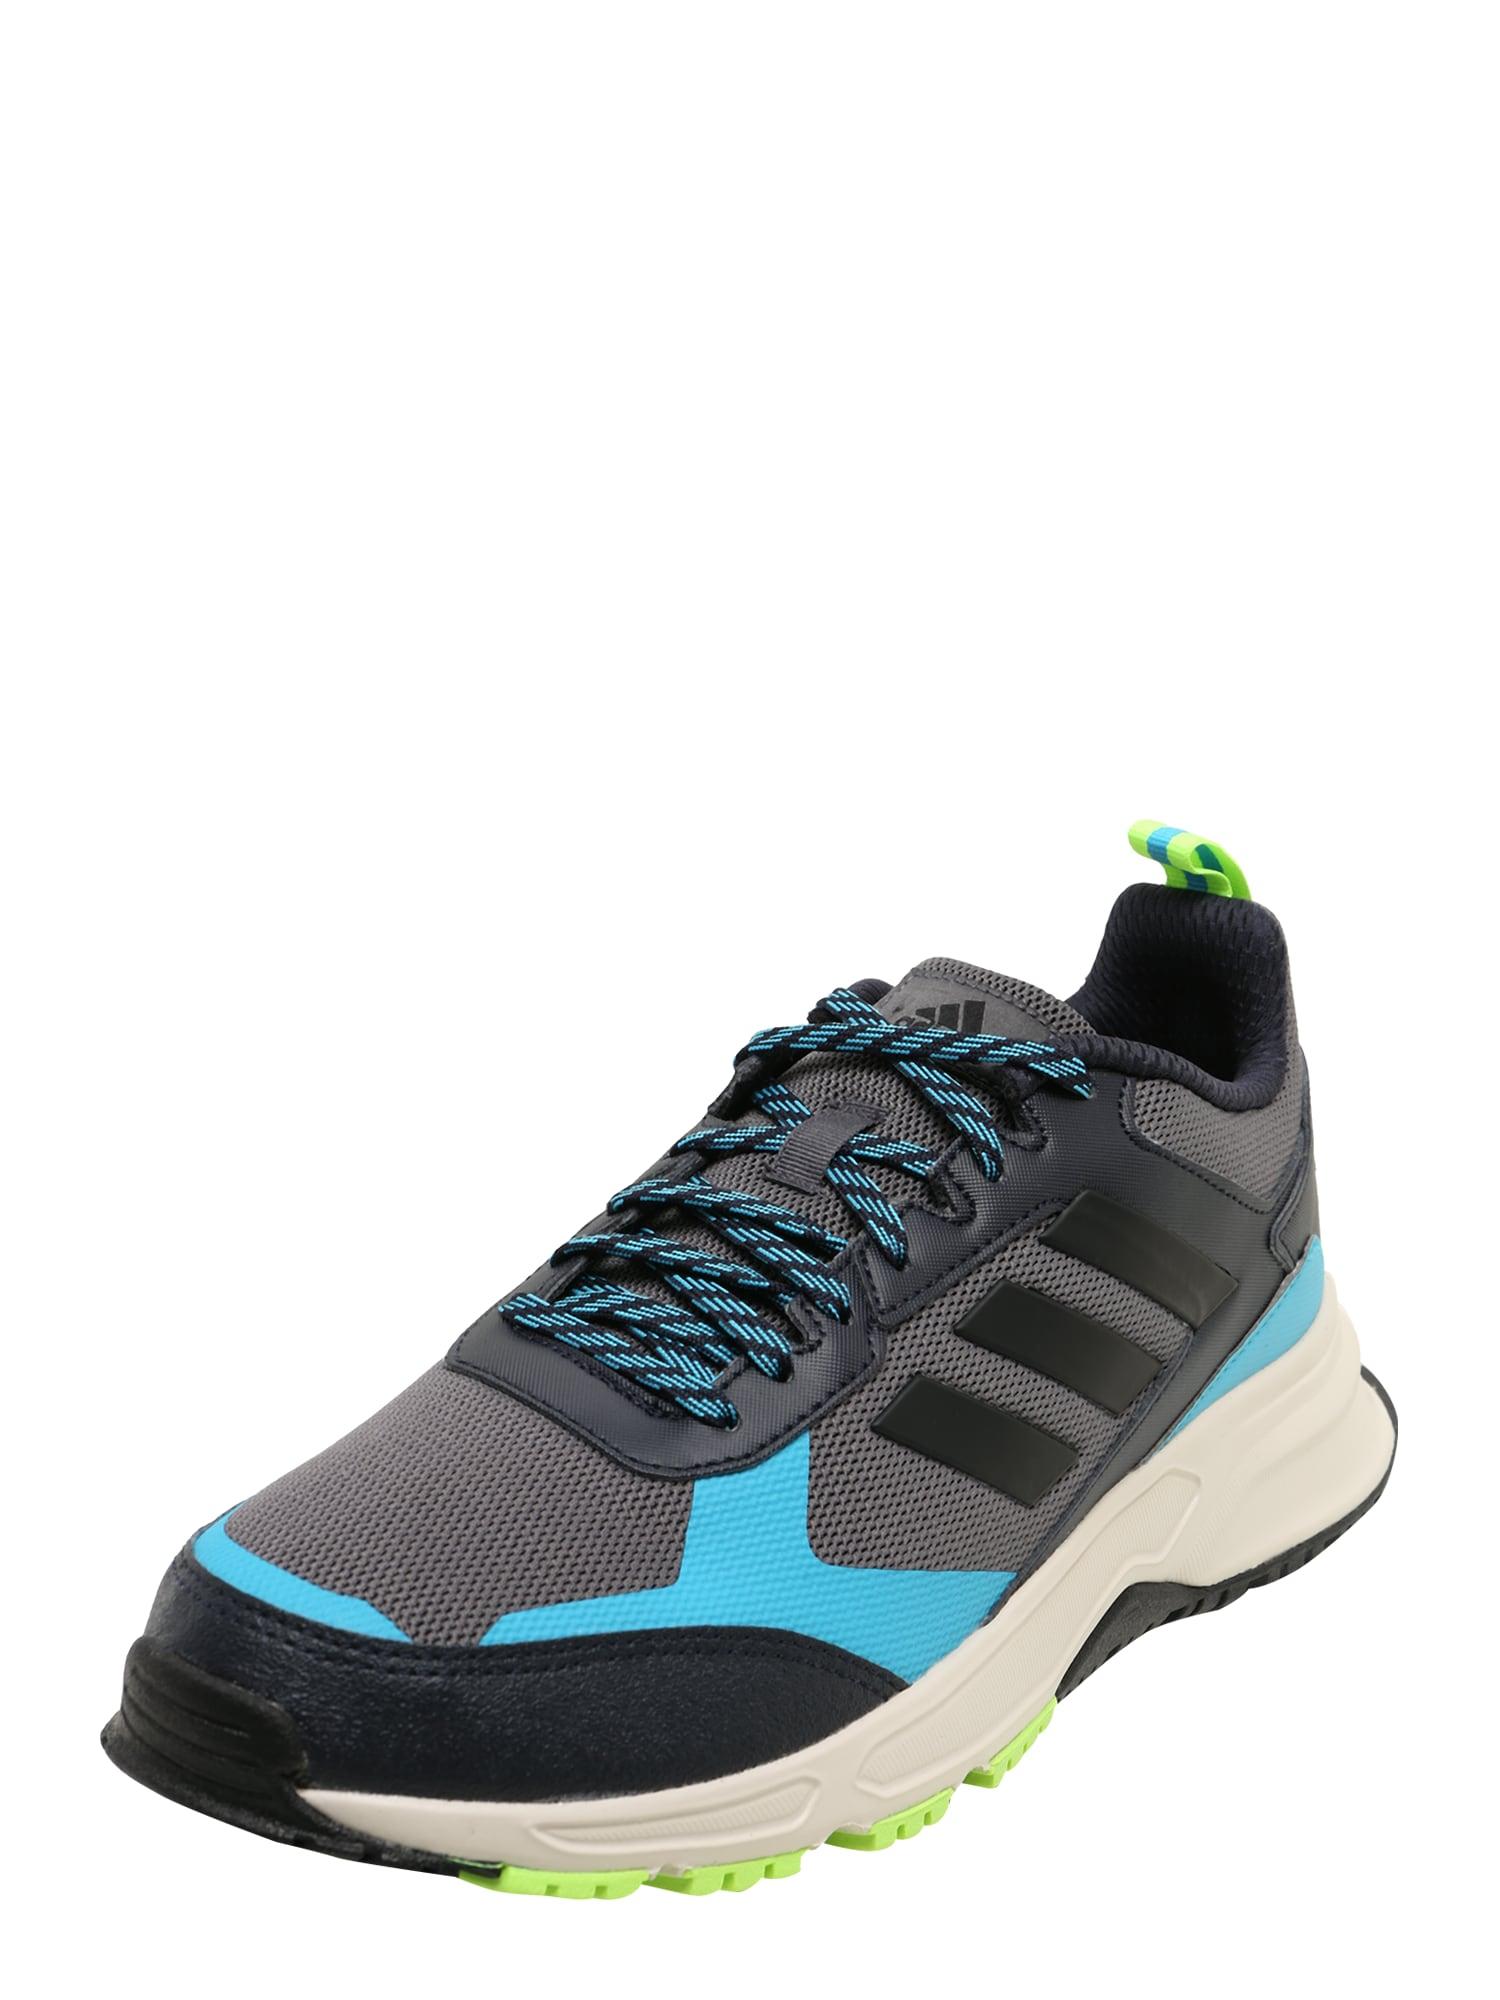 ADIDAS PERFORMANCE Sportovní boty 'Rockadia Trail 3.0'  modrá / šedá / černá